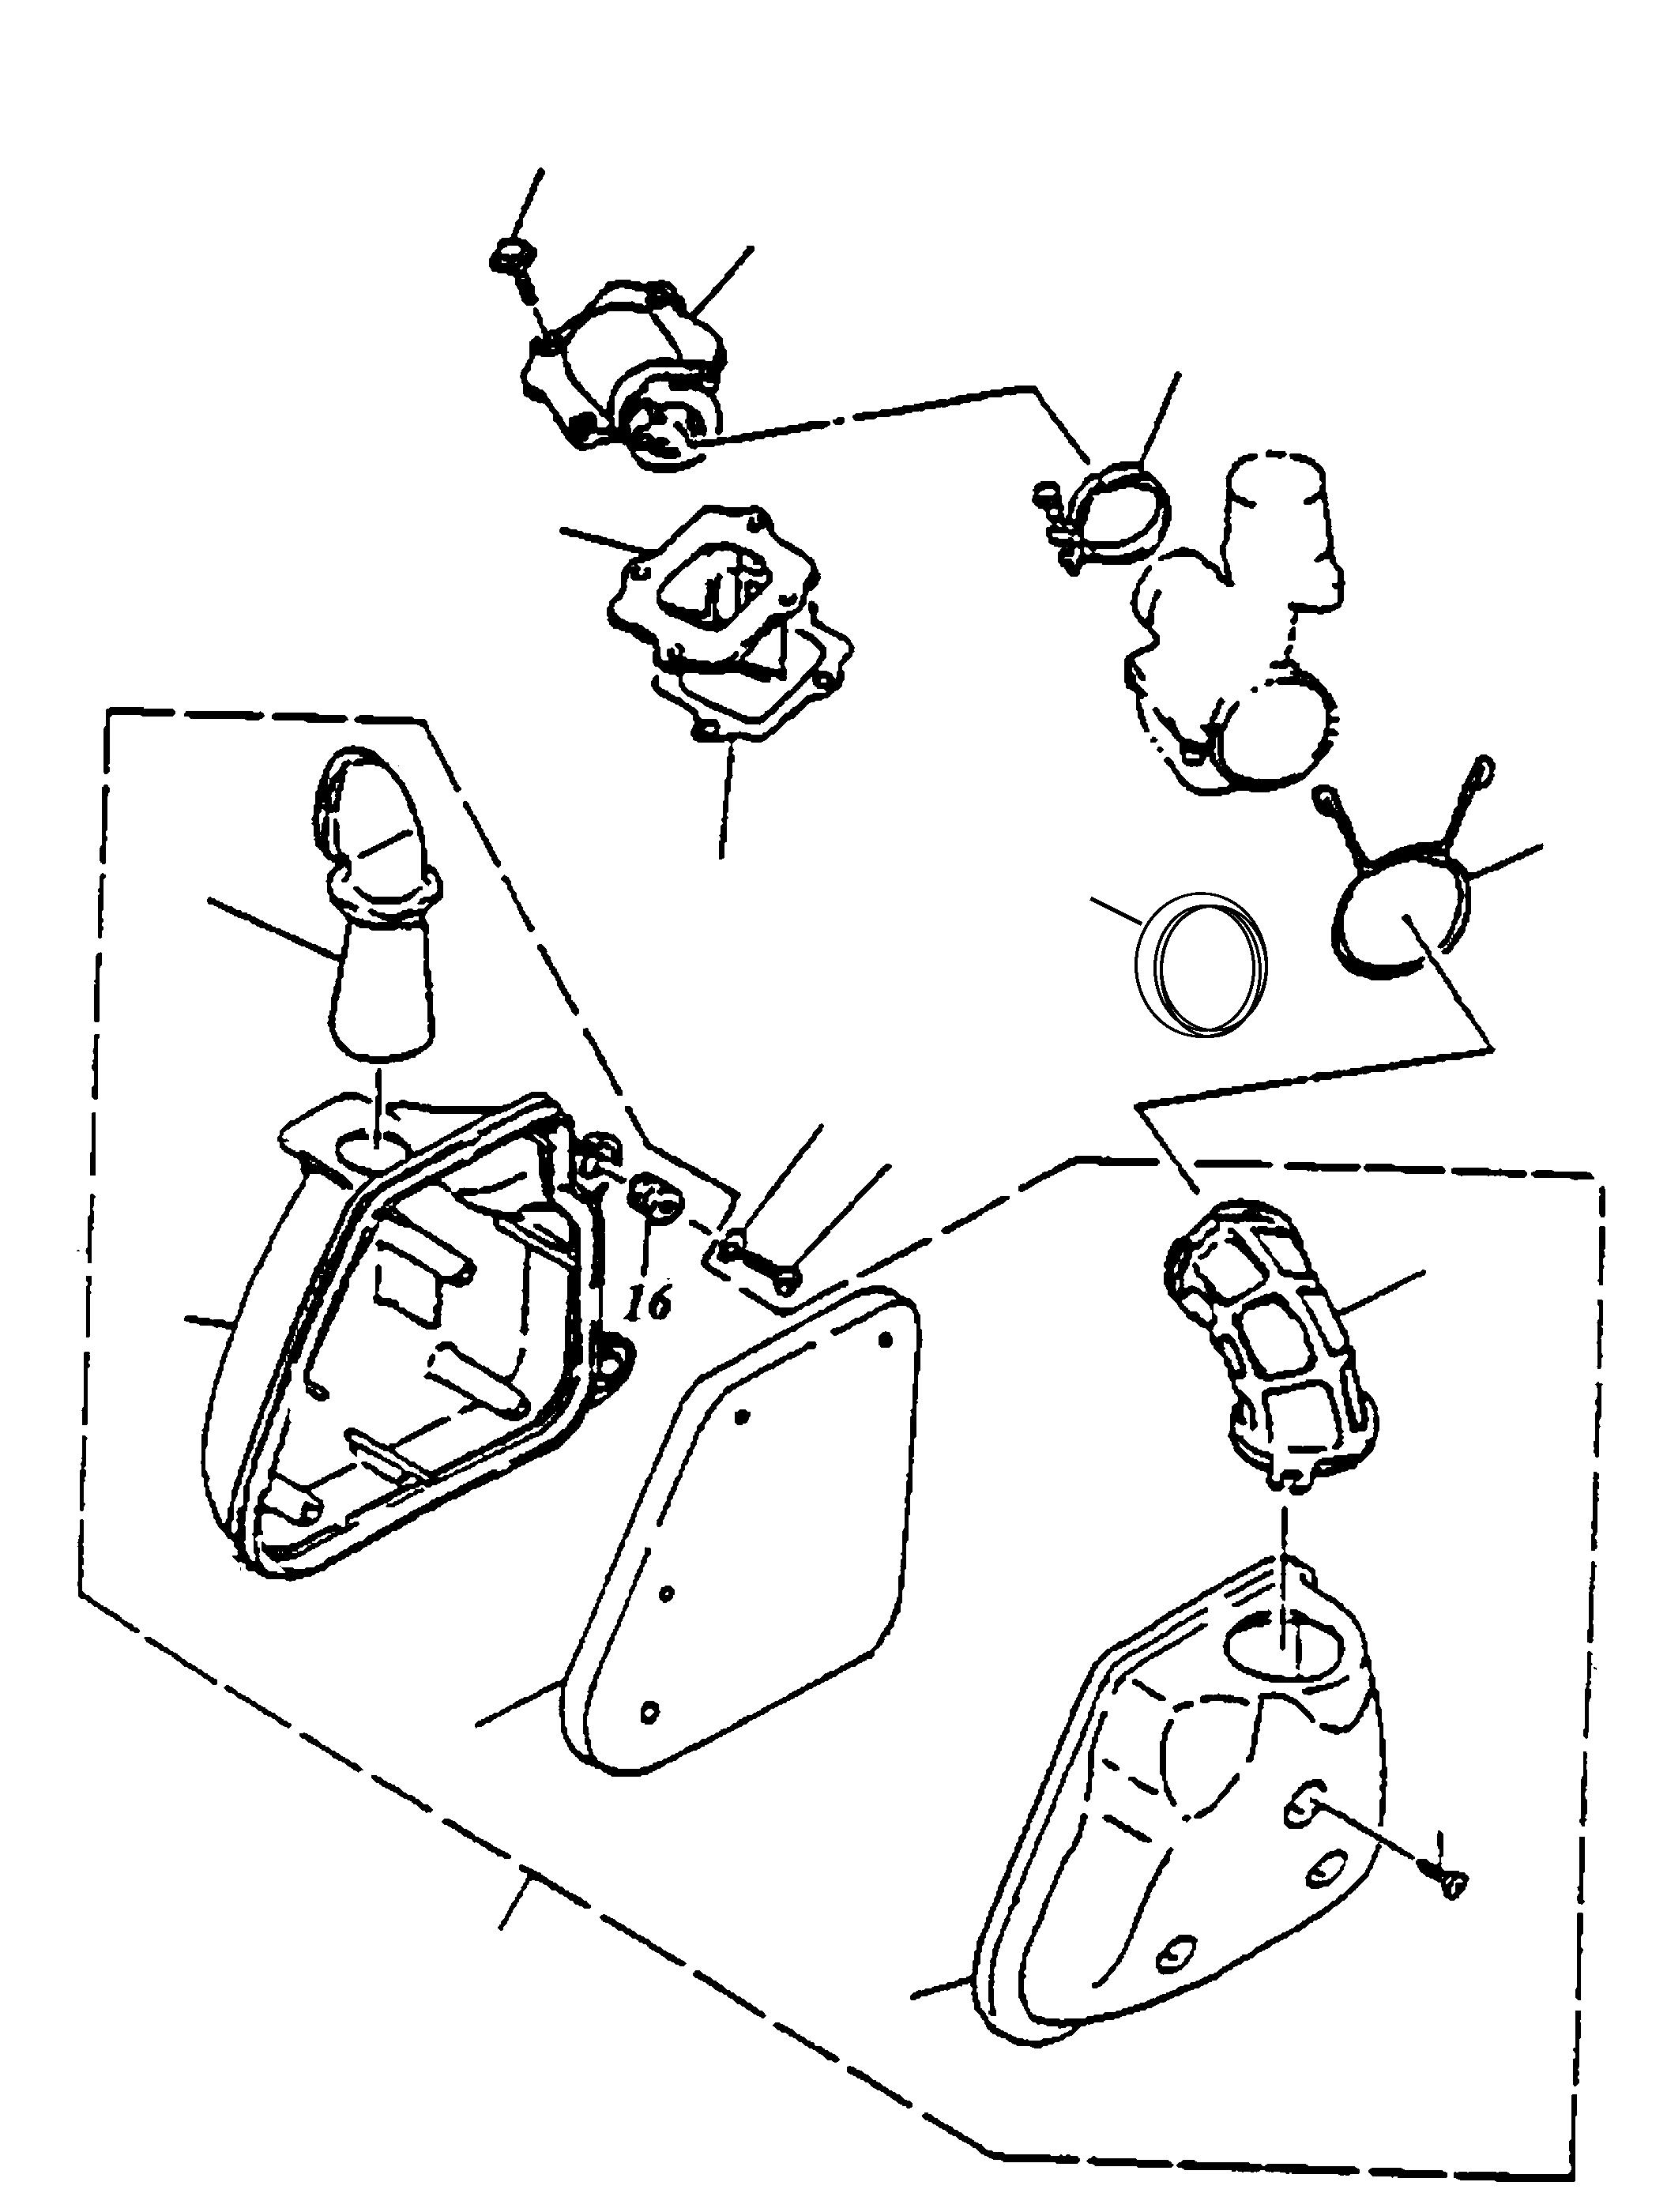 Einlasslamelle, Luftfilter